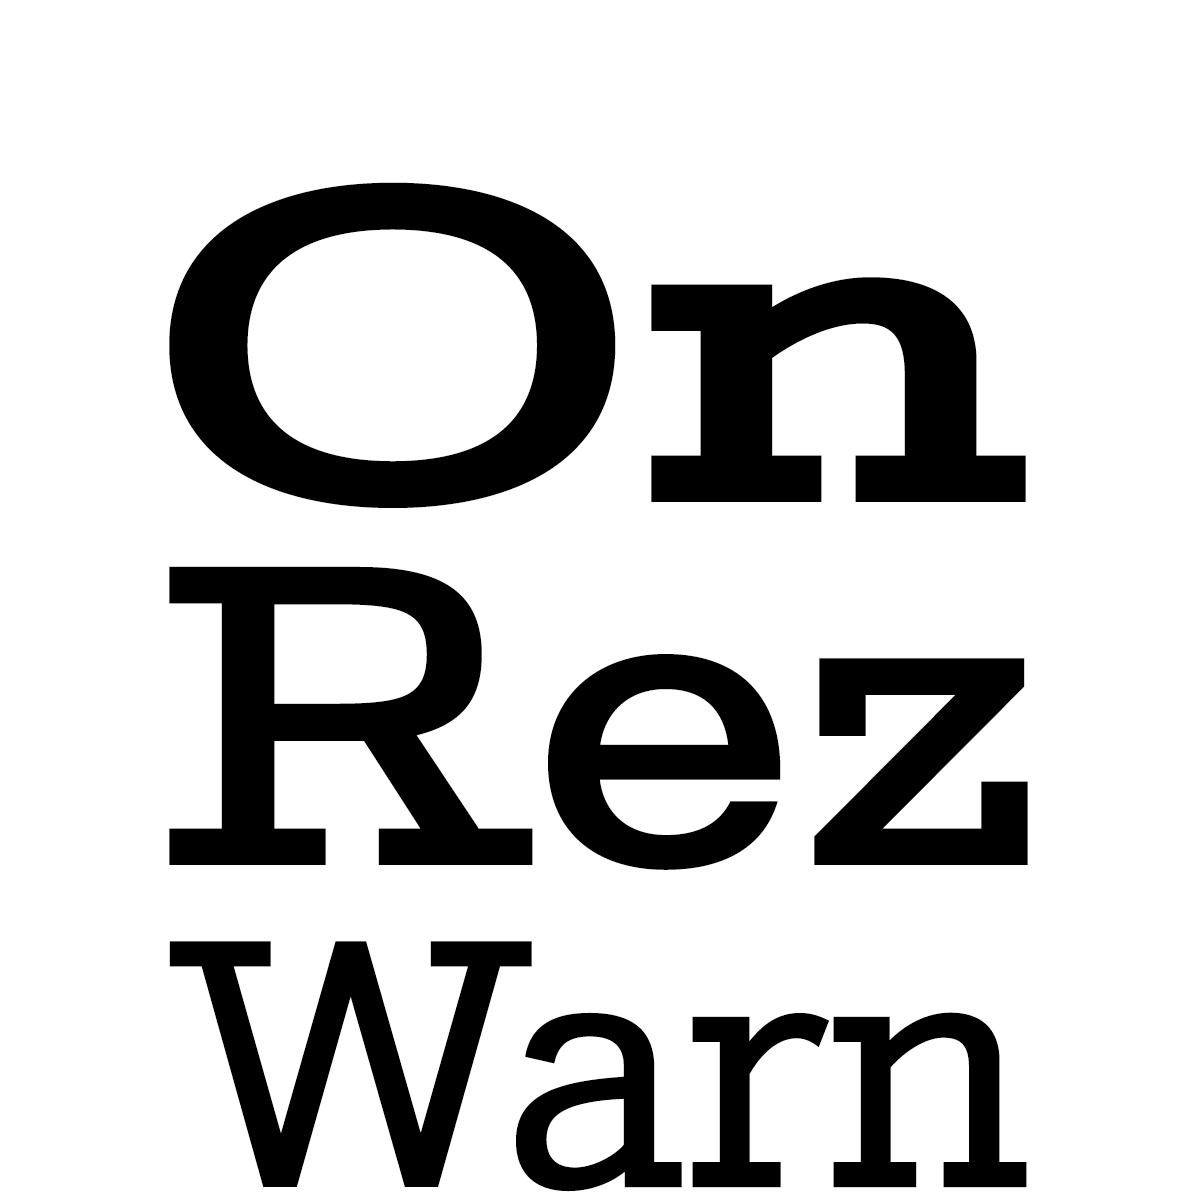 temp-image